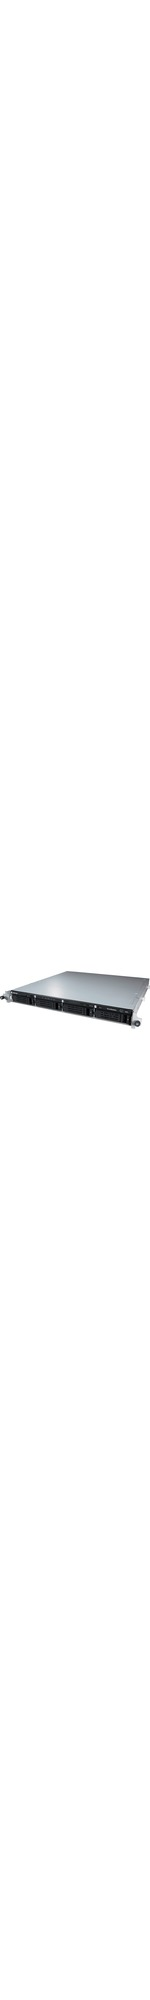 Buffalo TeraStation 4 x Total Bays NAS Server - Rack-mountable - Intel Atom D2700 Dual-core 2.13 GHz